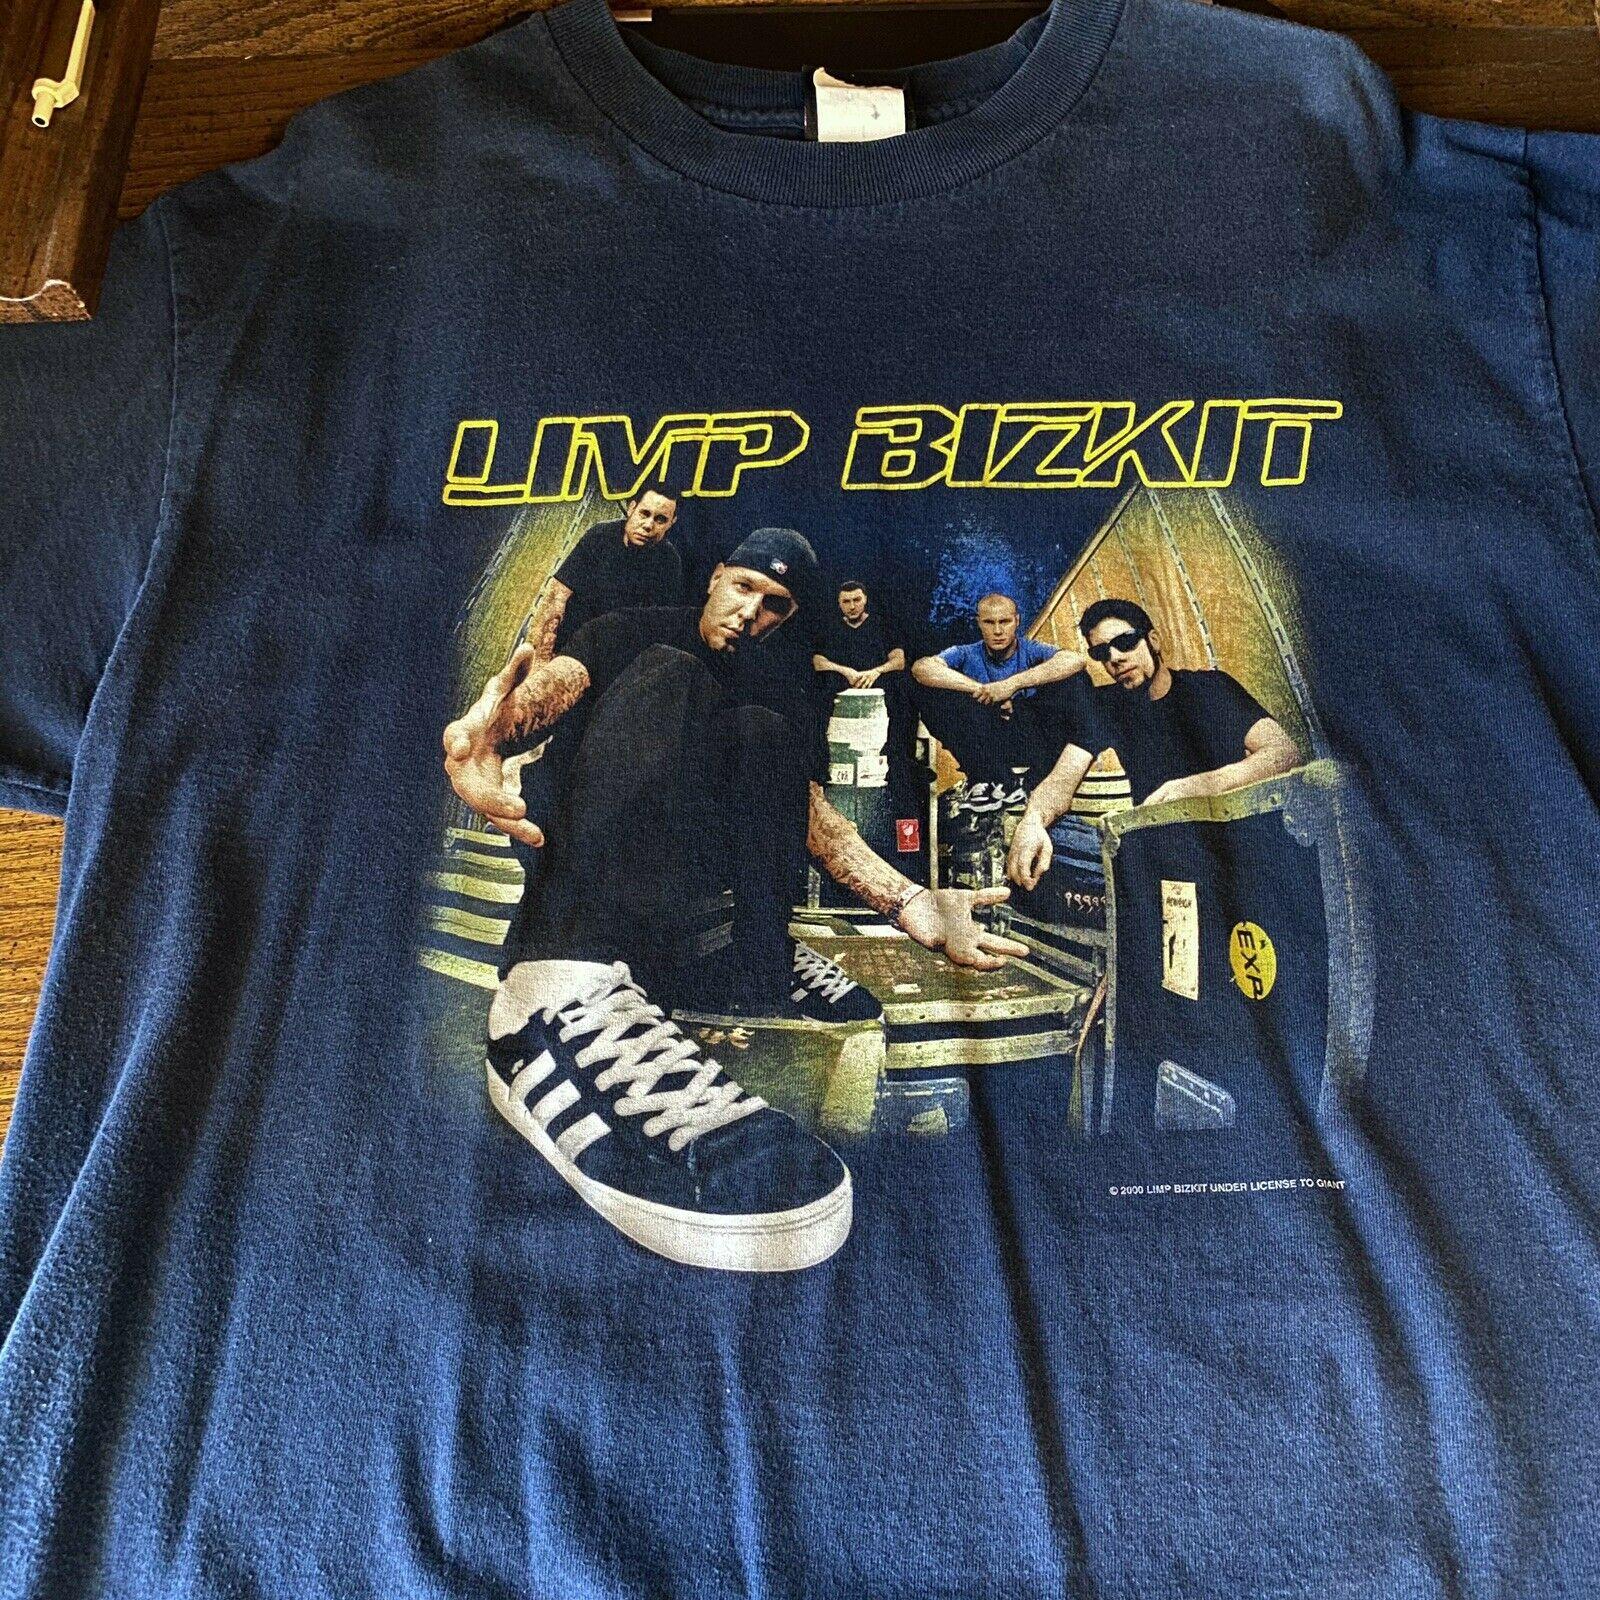 Limp Bizkit grande Original Vintage 2000 Oficial azul de marca gigante camiseta